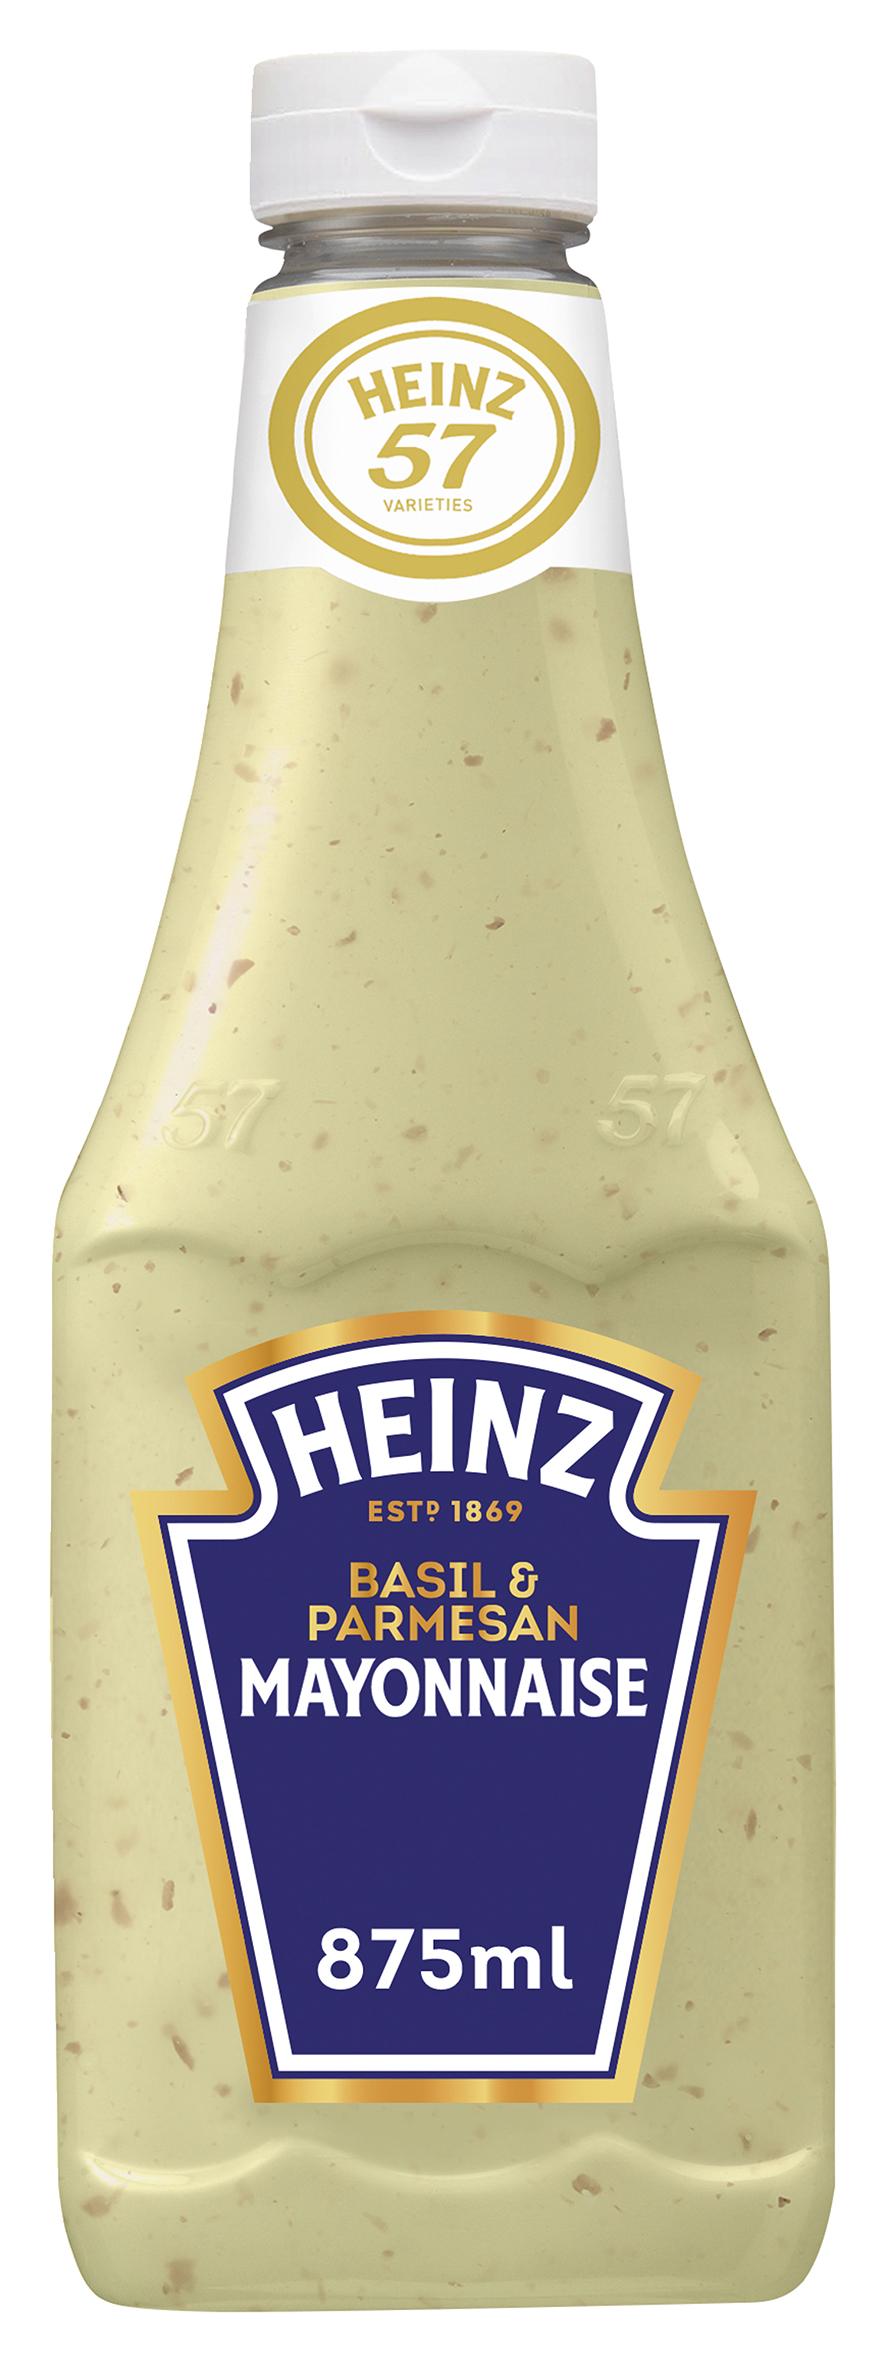 Heinz Basilikum & Parmesan Mayonnaise 875ml image